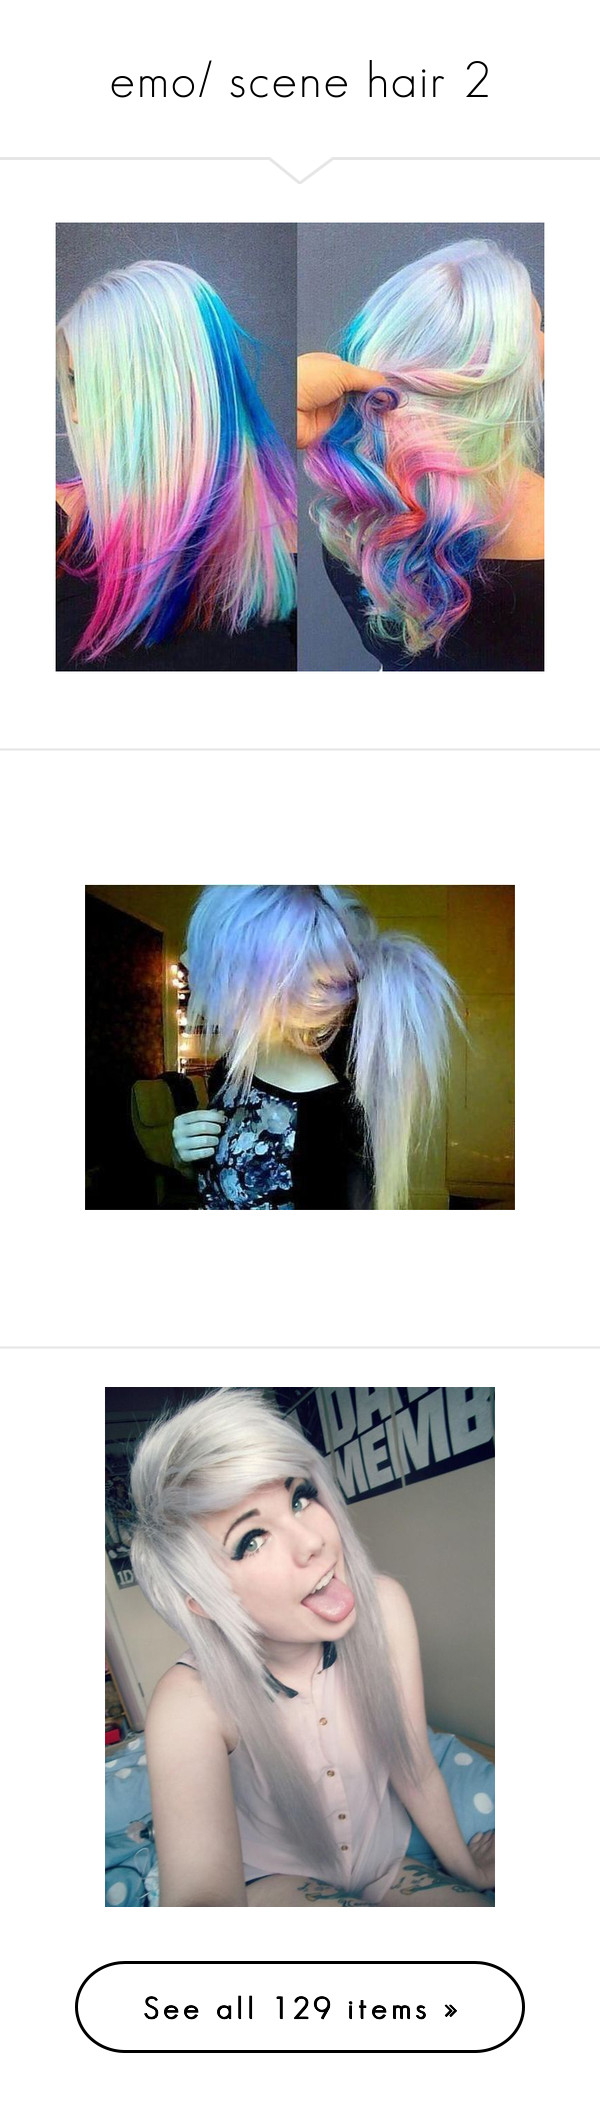 Emo scene hair